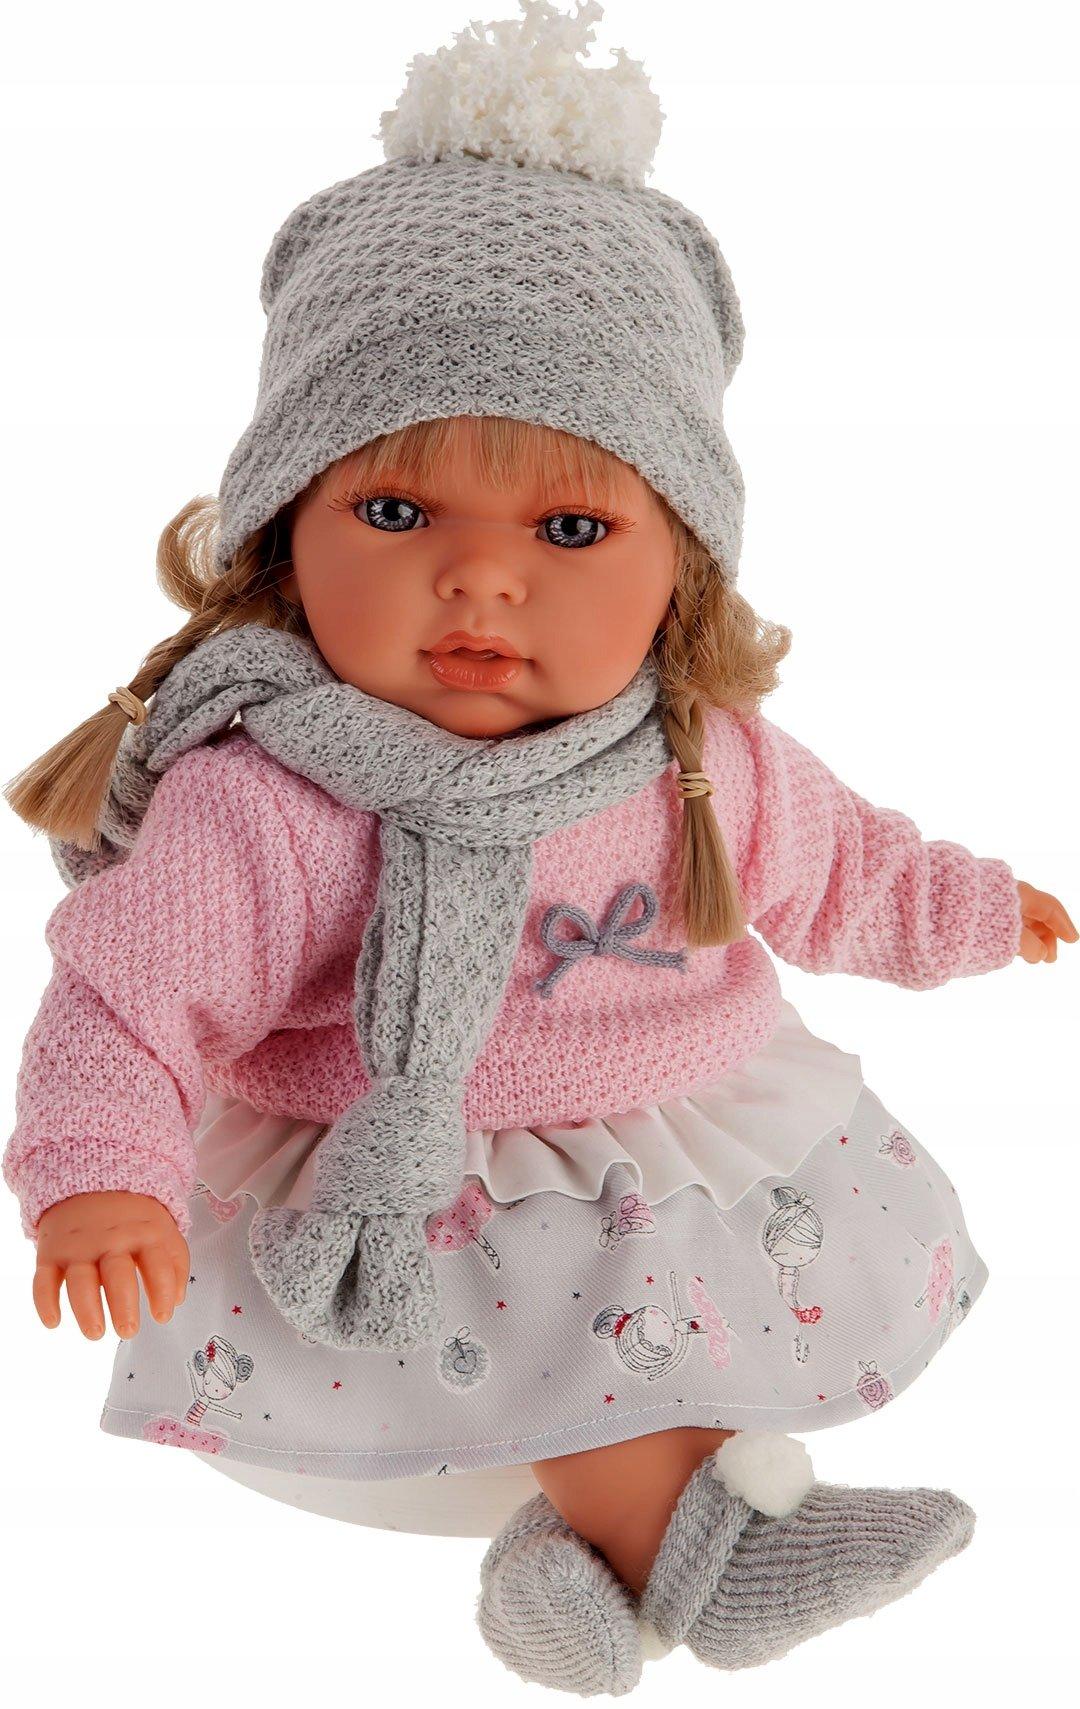 Hiszpańska lalka Antonio Juan - Any Bufanda - dziewczynka